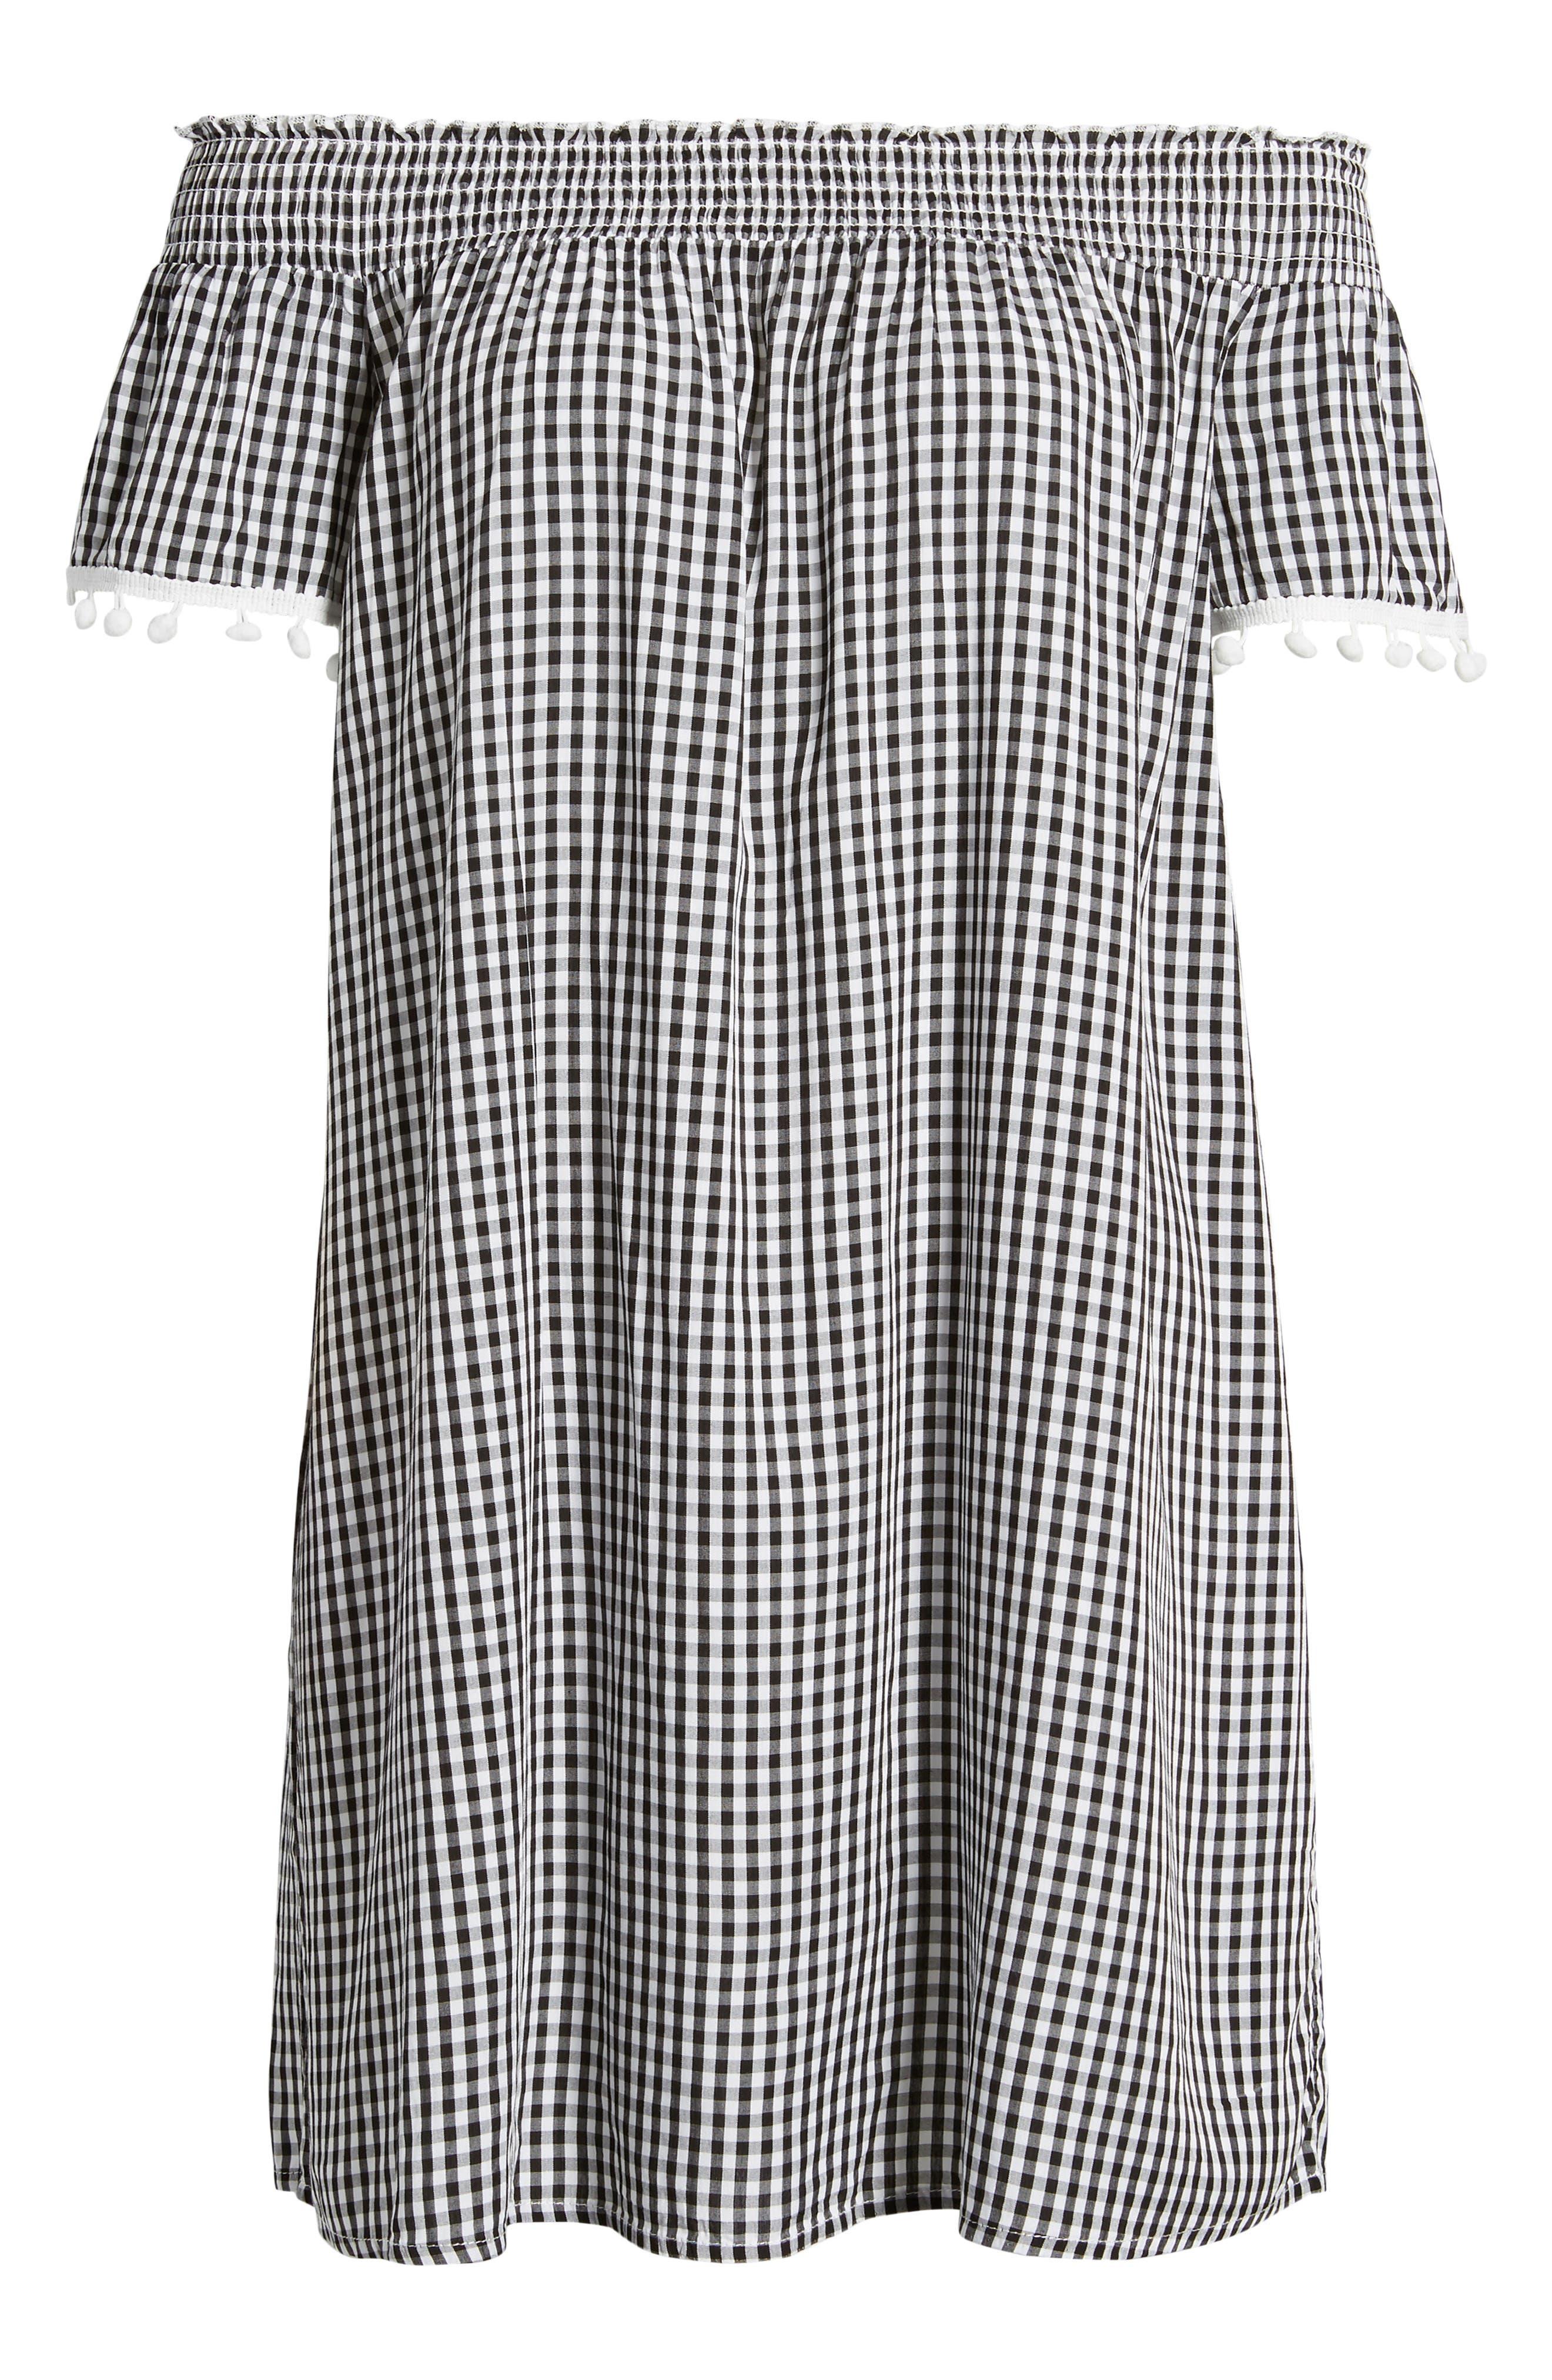 Off the Shoulder Gingham Dress,                             Alternate thumbnail 6, color,                             Black White Gingham